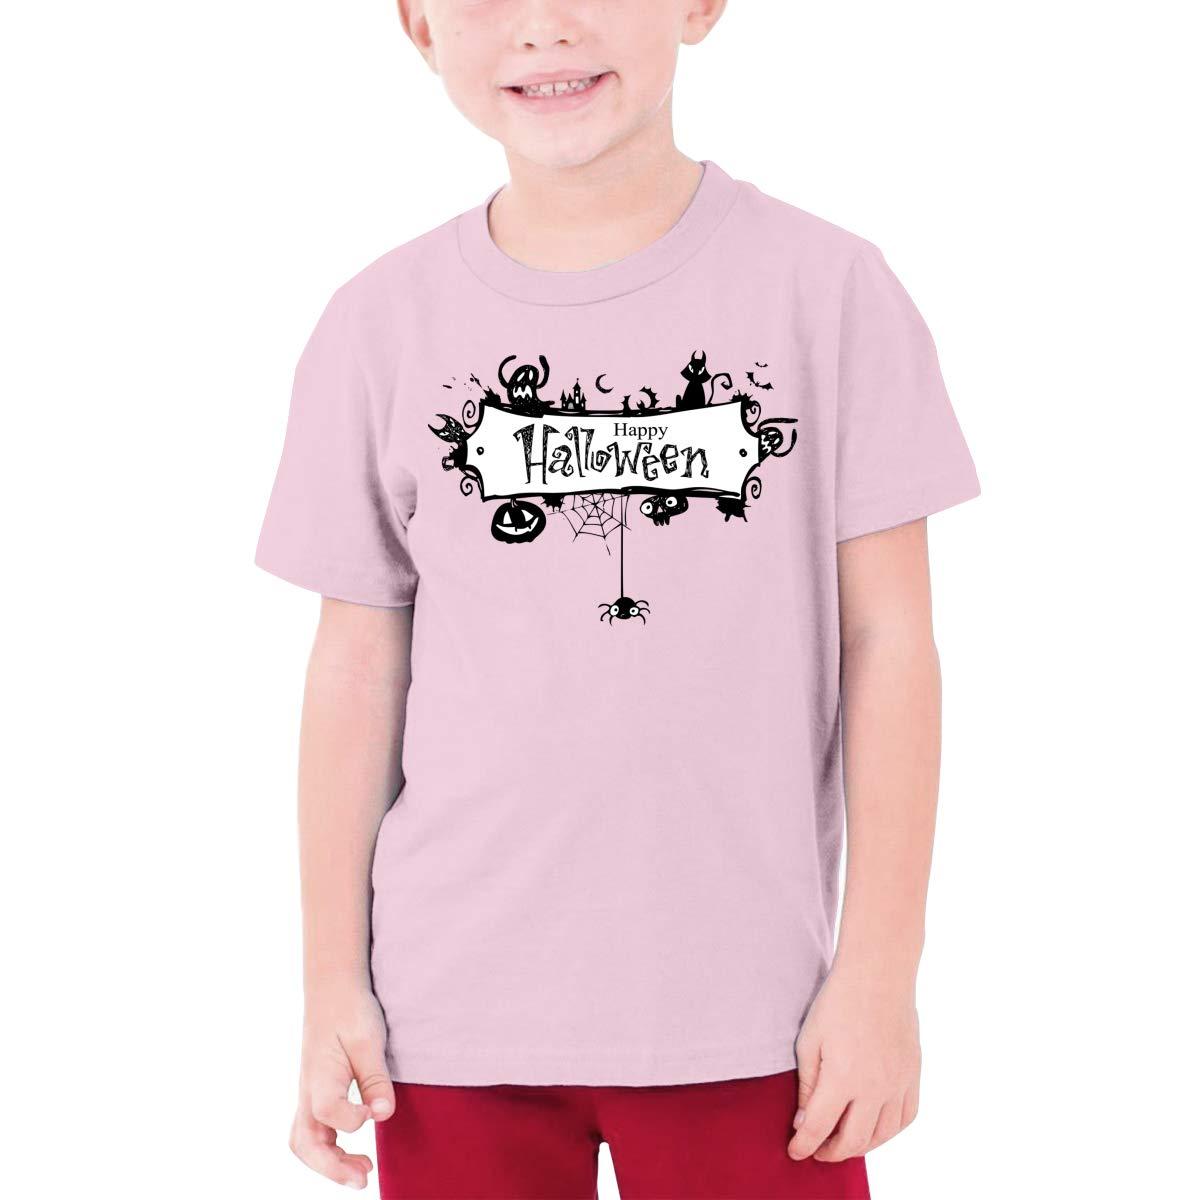 CiXianFuLu Happy Halloween Teenagers Soft T-Shirt Unisex Black